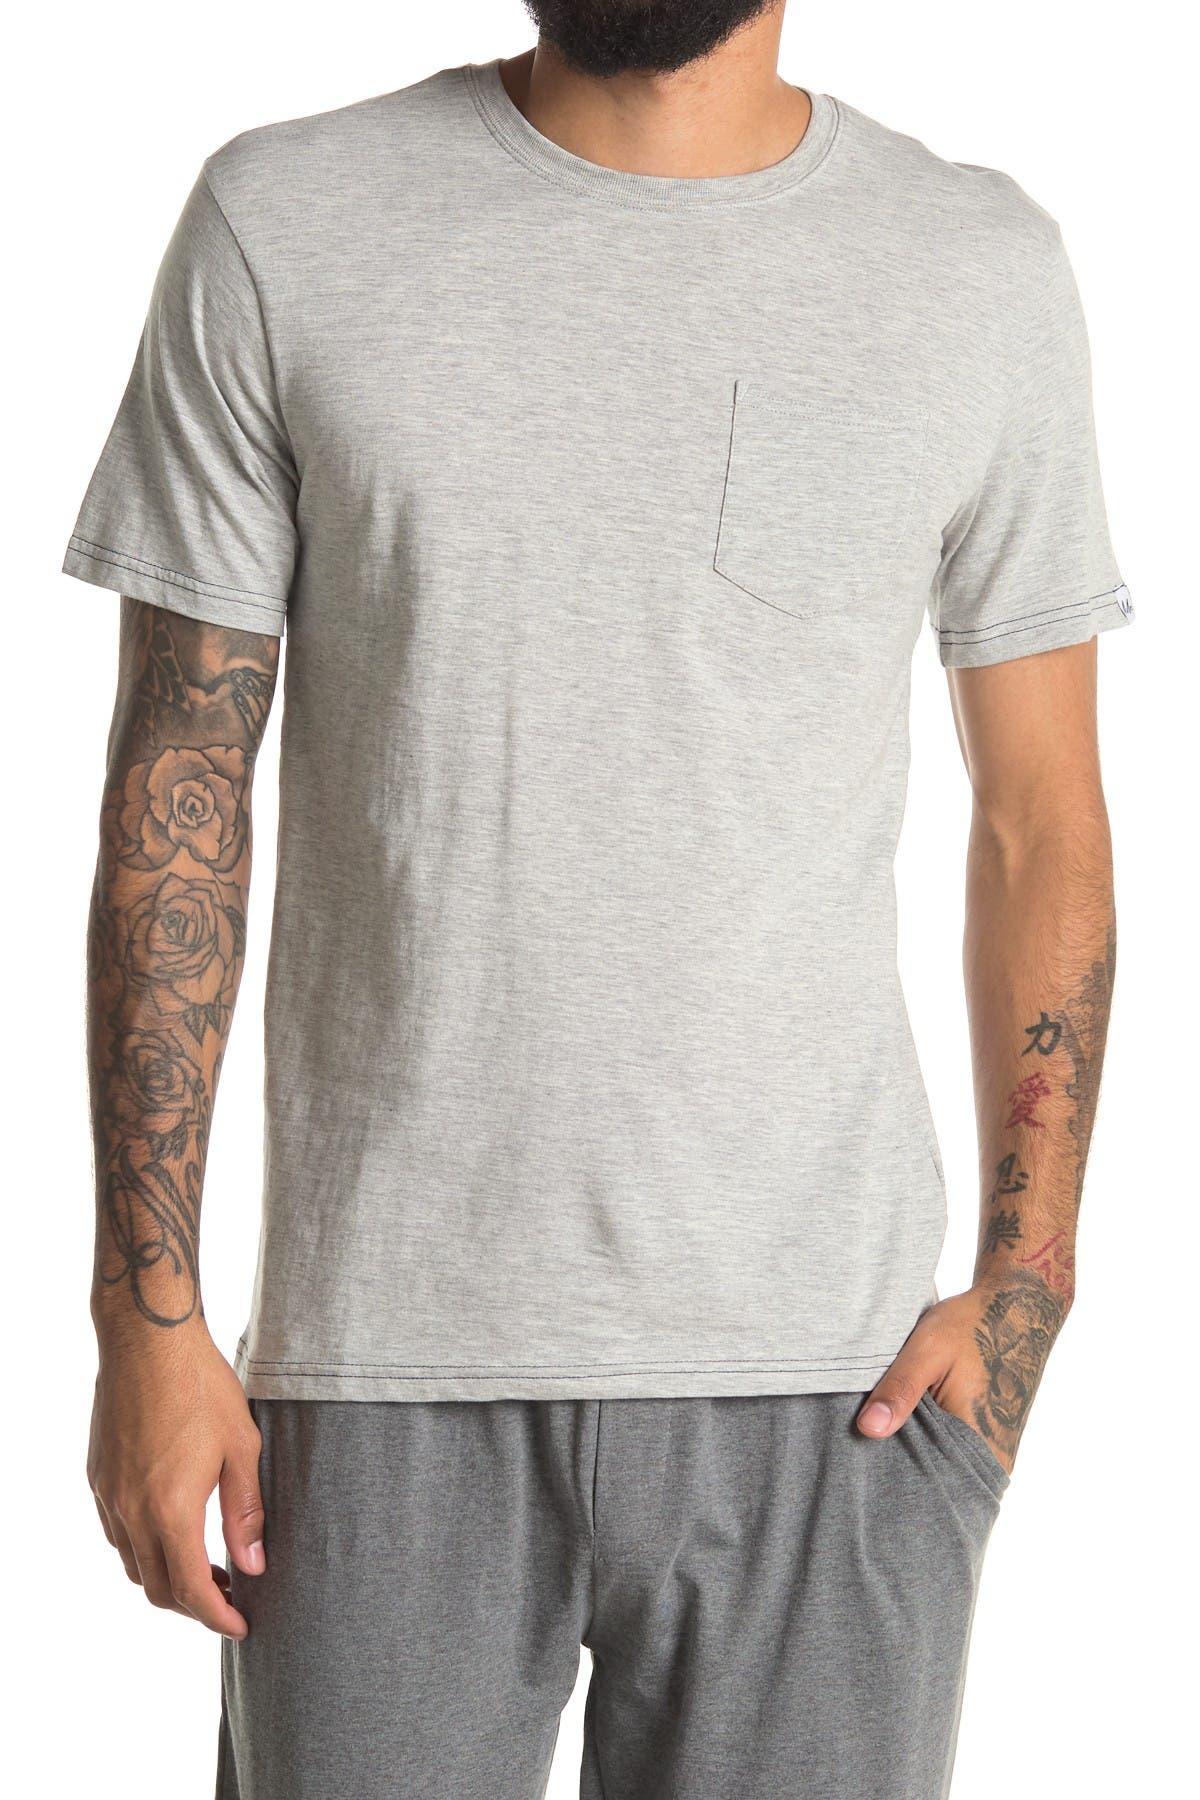 Image of Mister Short Sleeve Pocket Lounge T-Shirt